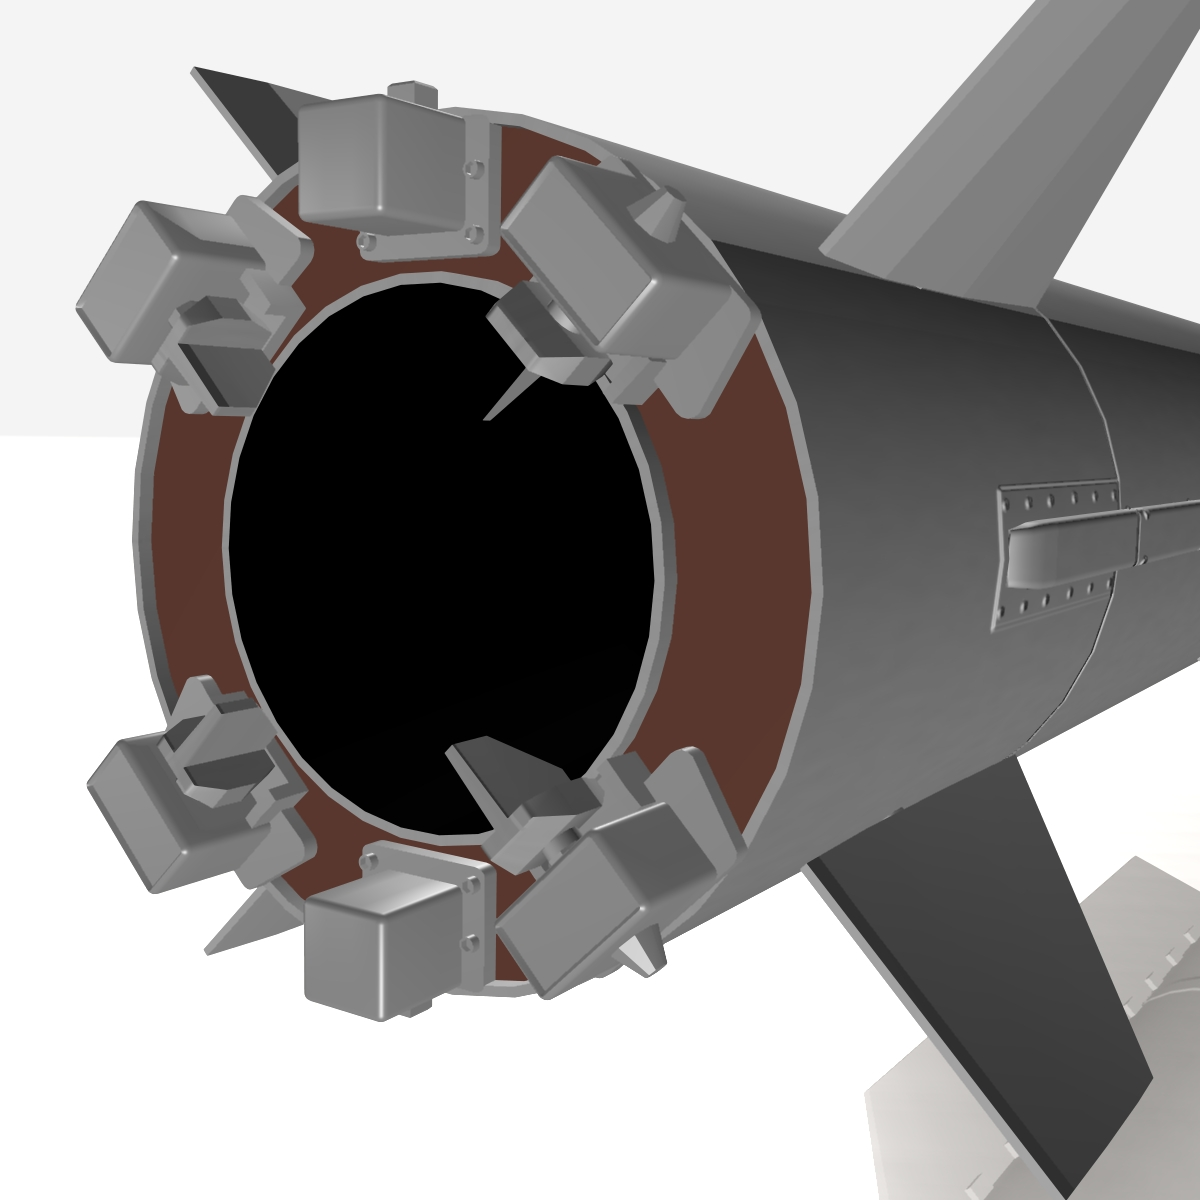 БНХАУ-ын С-400 пуужин 3d загвар 3ds dxf cob x obj 157971